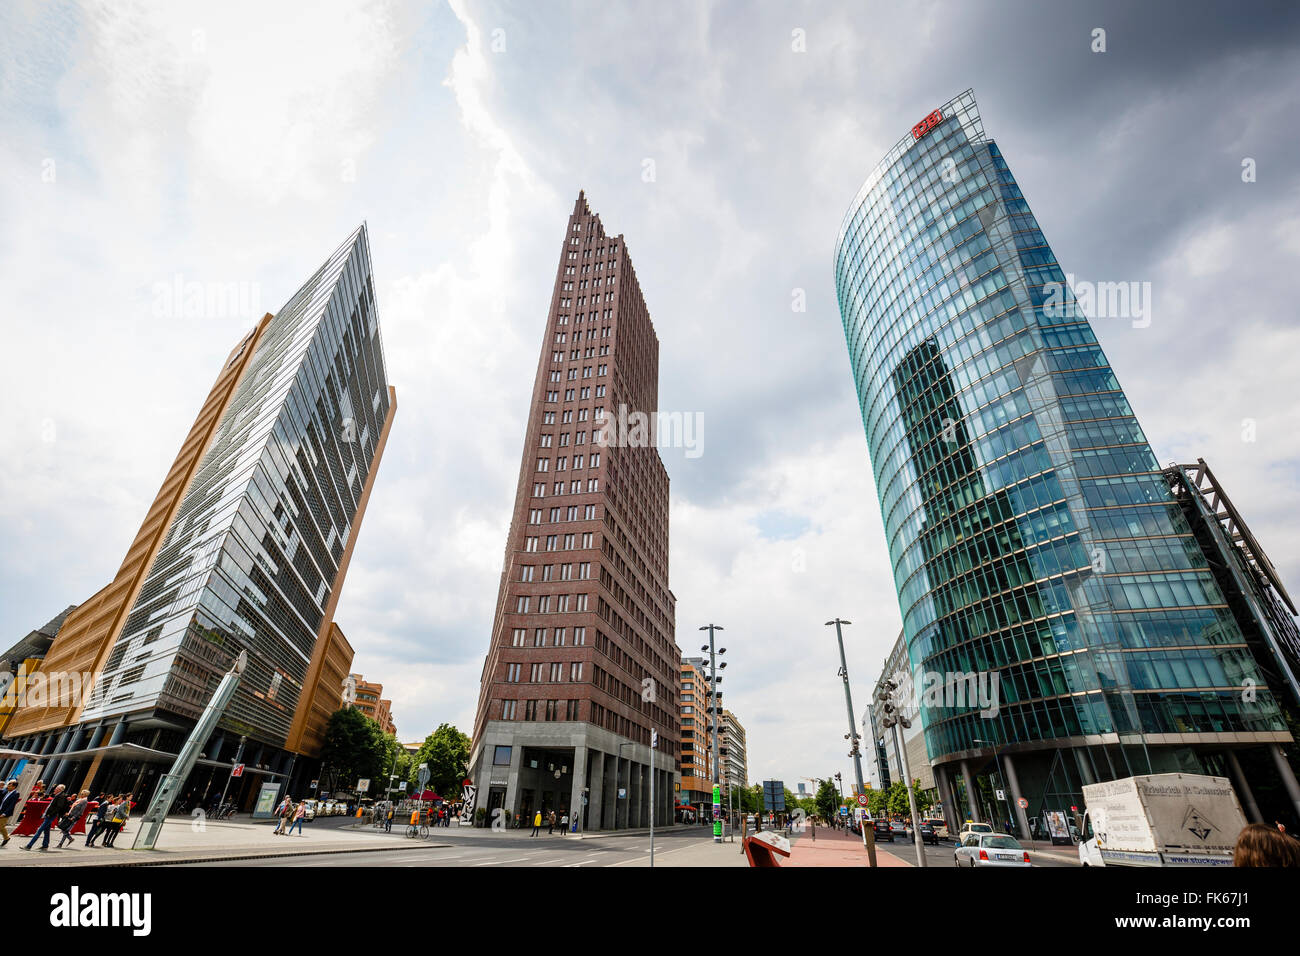 Buildings on Potsdamer Platz, Mitte, Berlin, Germany, Europe - Stock Image